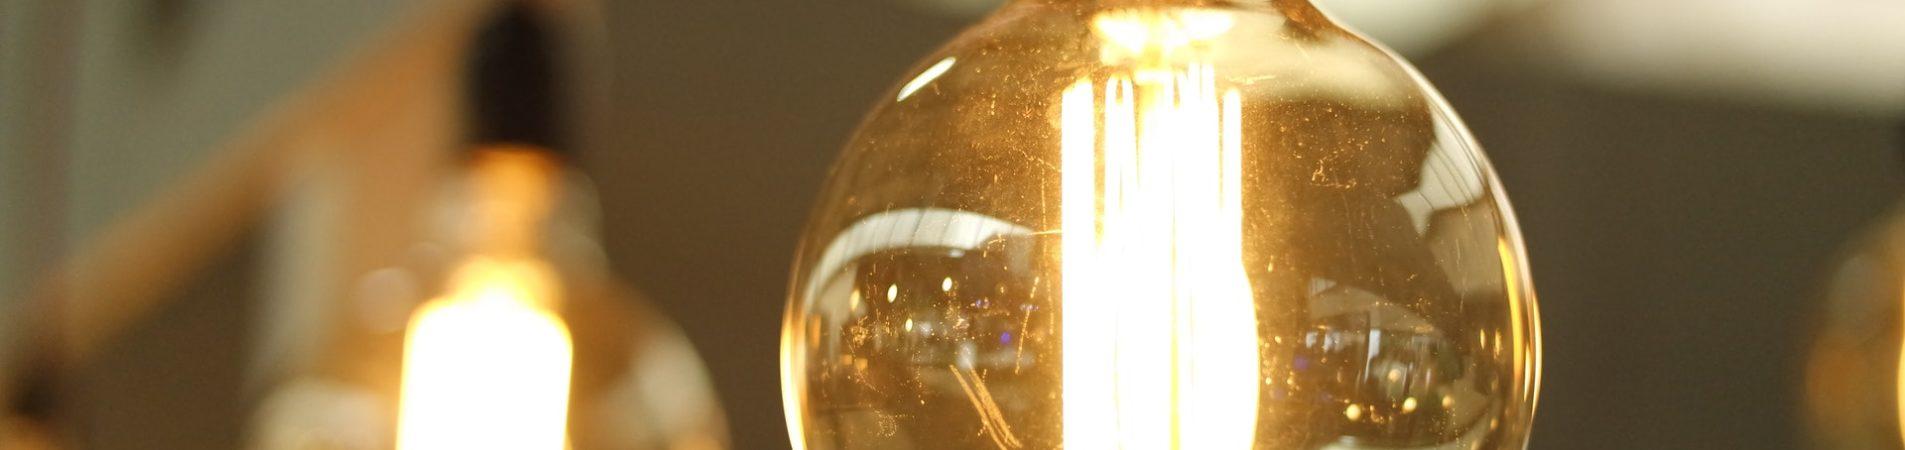 LED verlichting - Deboled webshop